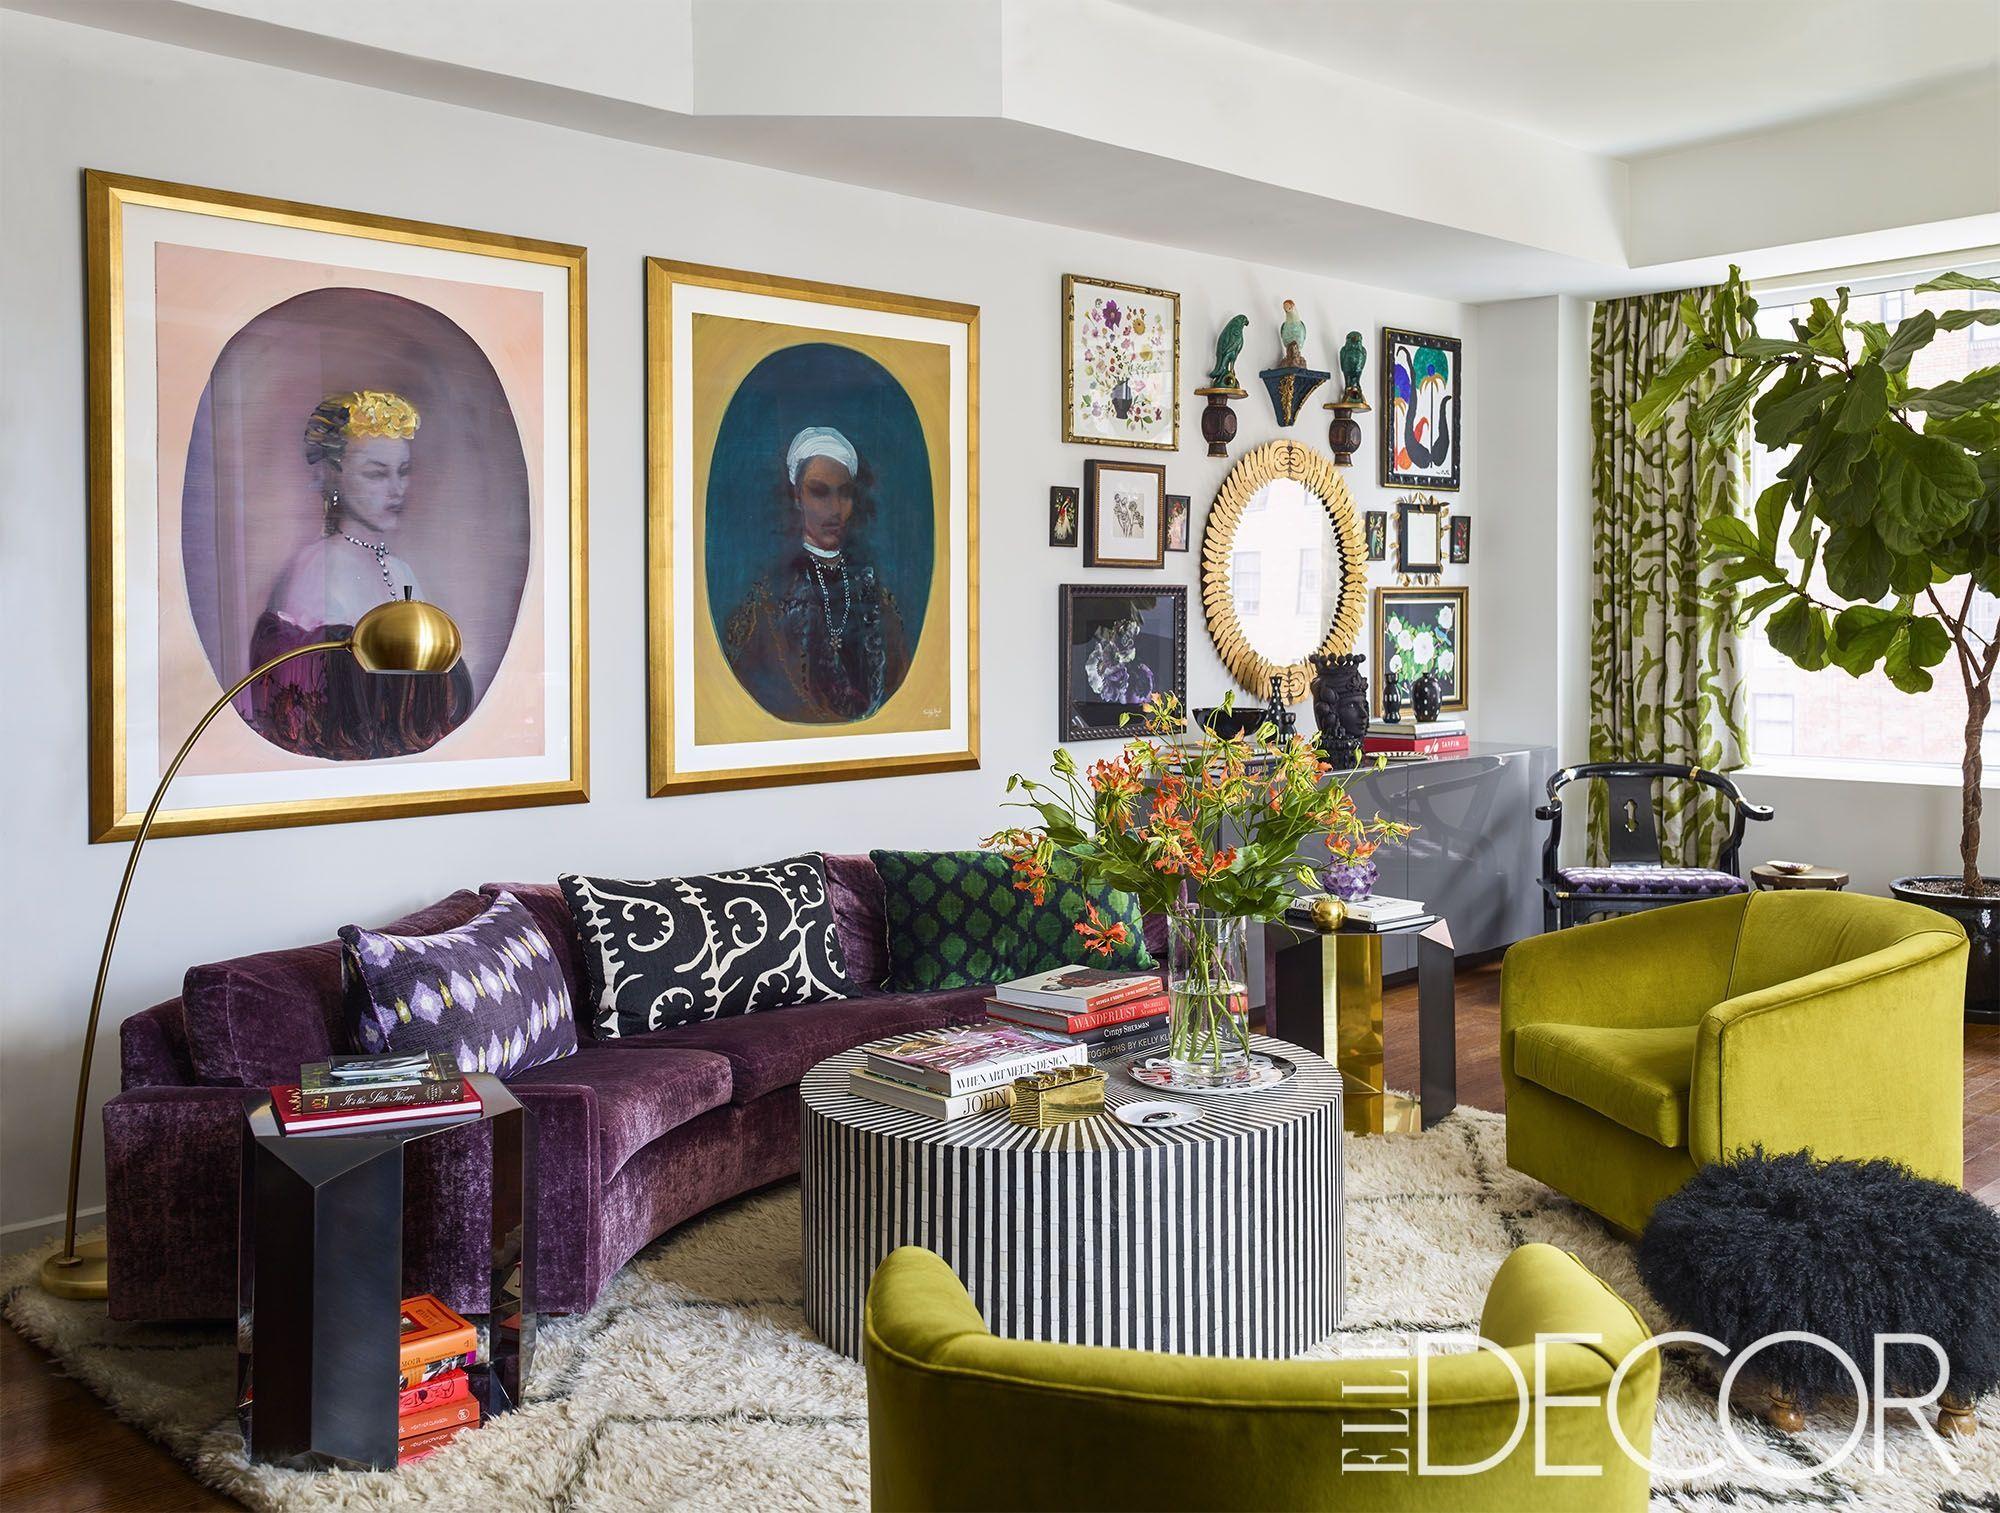 online art stores. Interior Design Boutiques   Best Boutiques and Design Stores